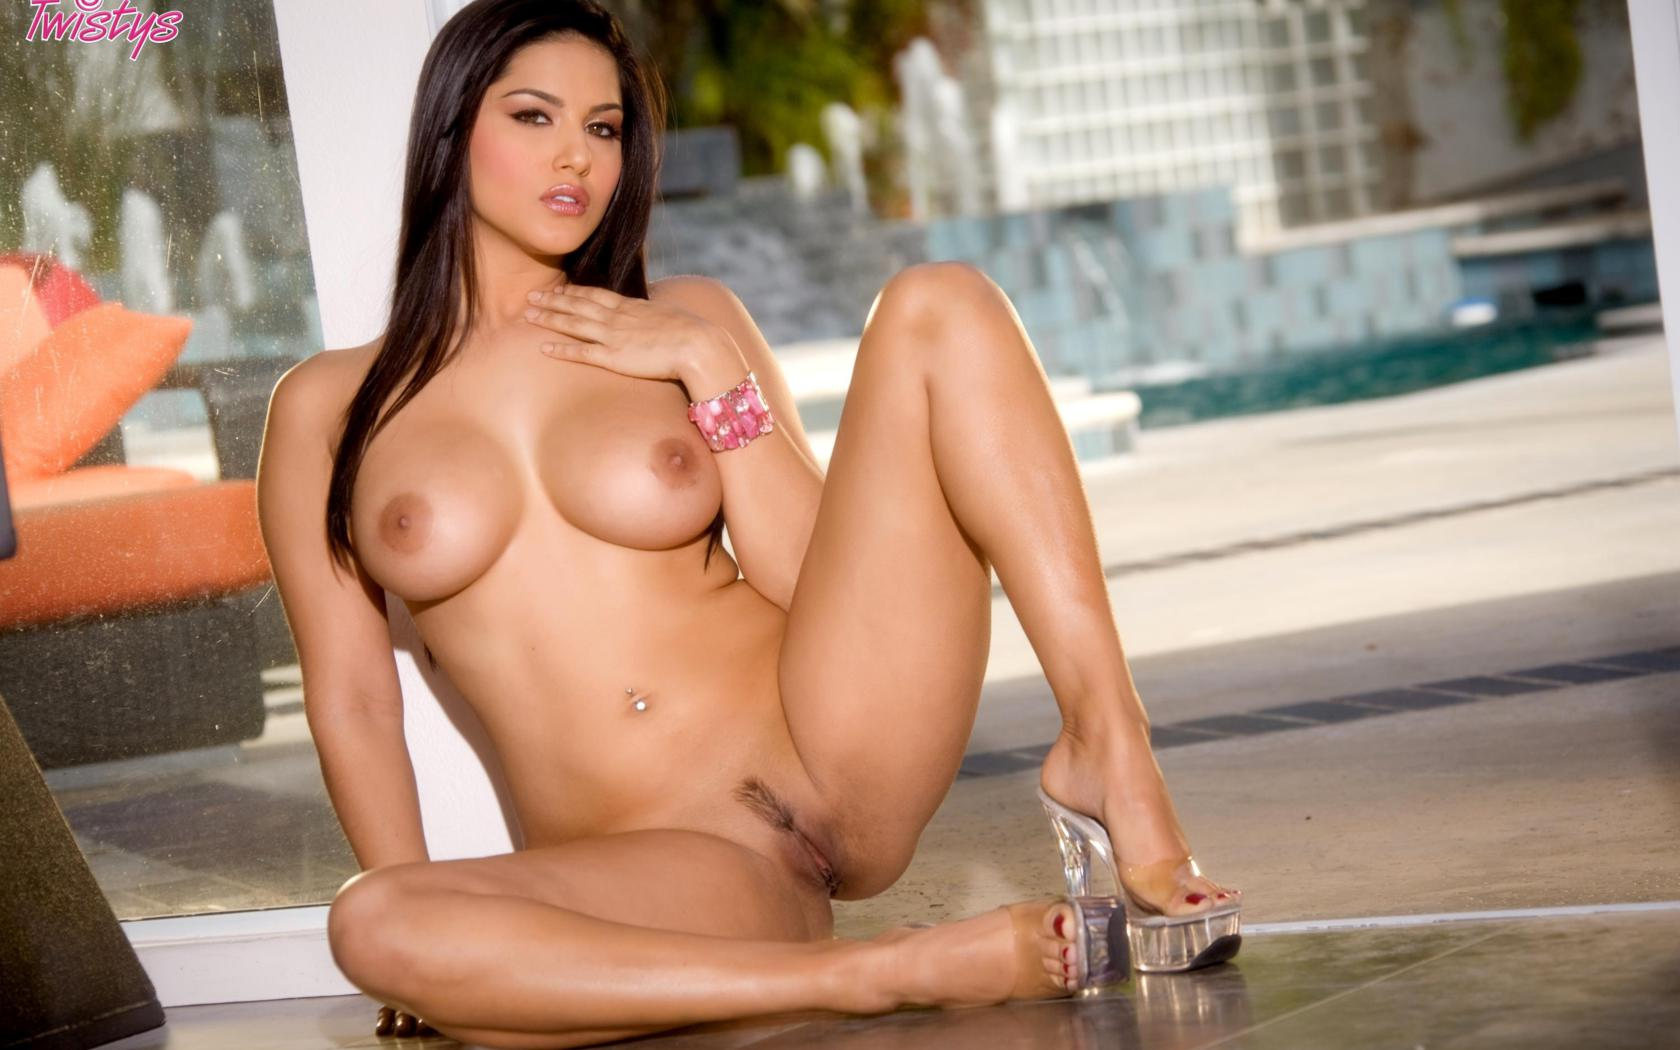 rhea perlman nude